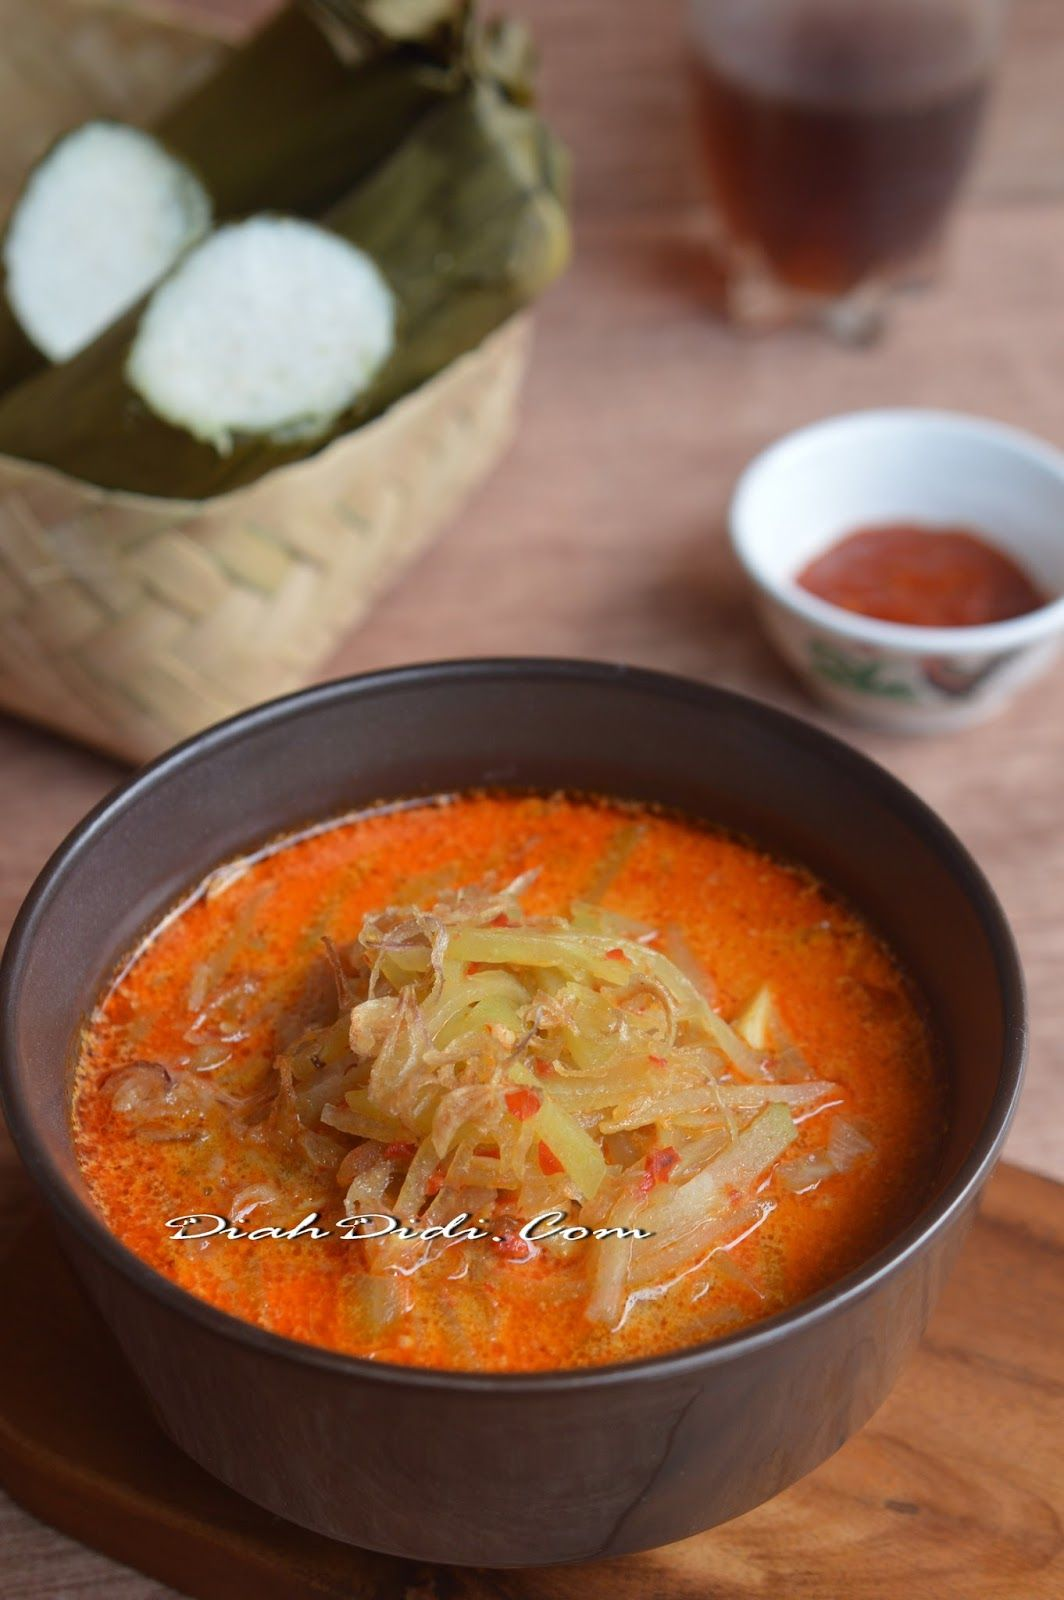 Resep Lontong Sayur Labu Siam : resep, lontong, sayur, LONTONG❤️,, Sayur, Lodeh, Ideas, Food,, Spicy, Recipes,, Indonesian